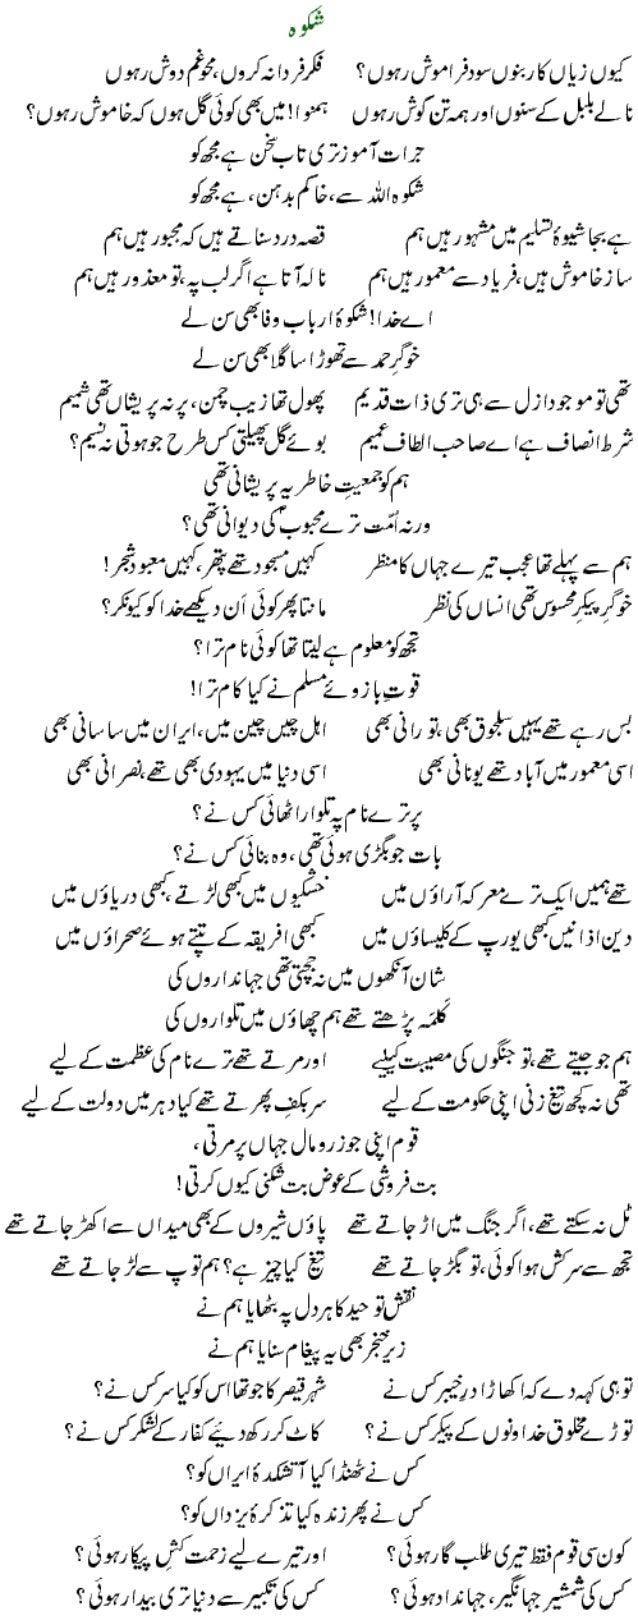 Allama iqbal last book name in essay